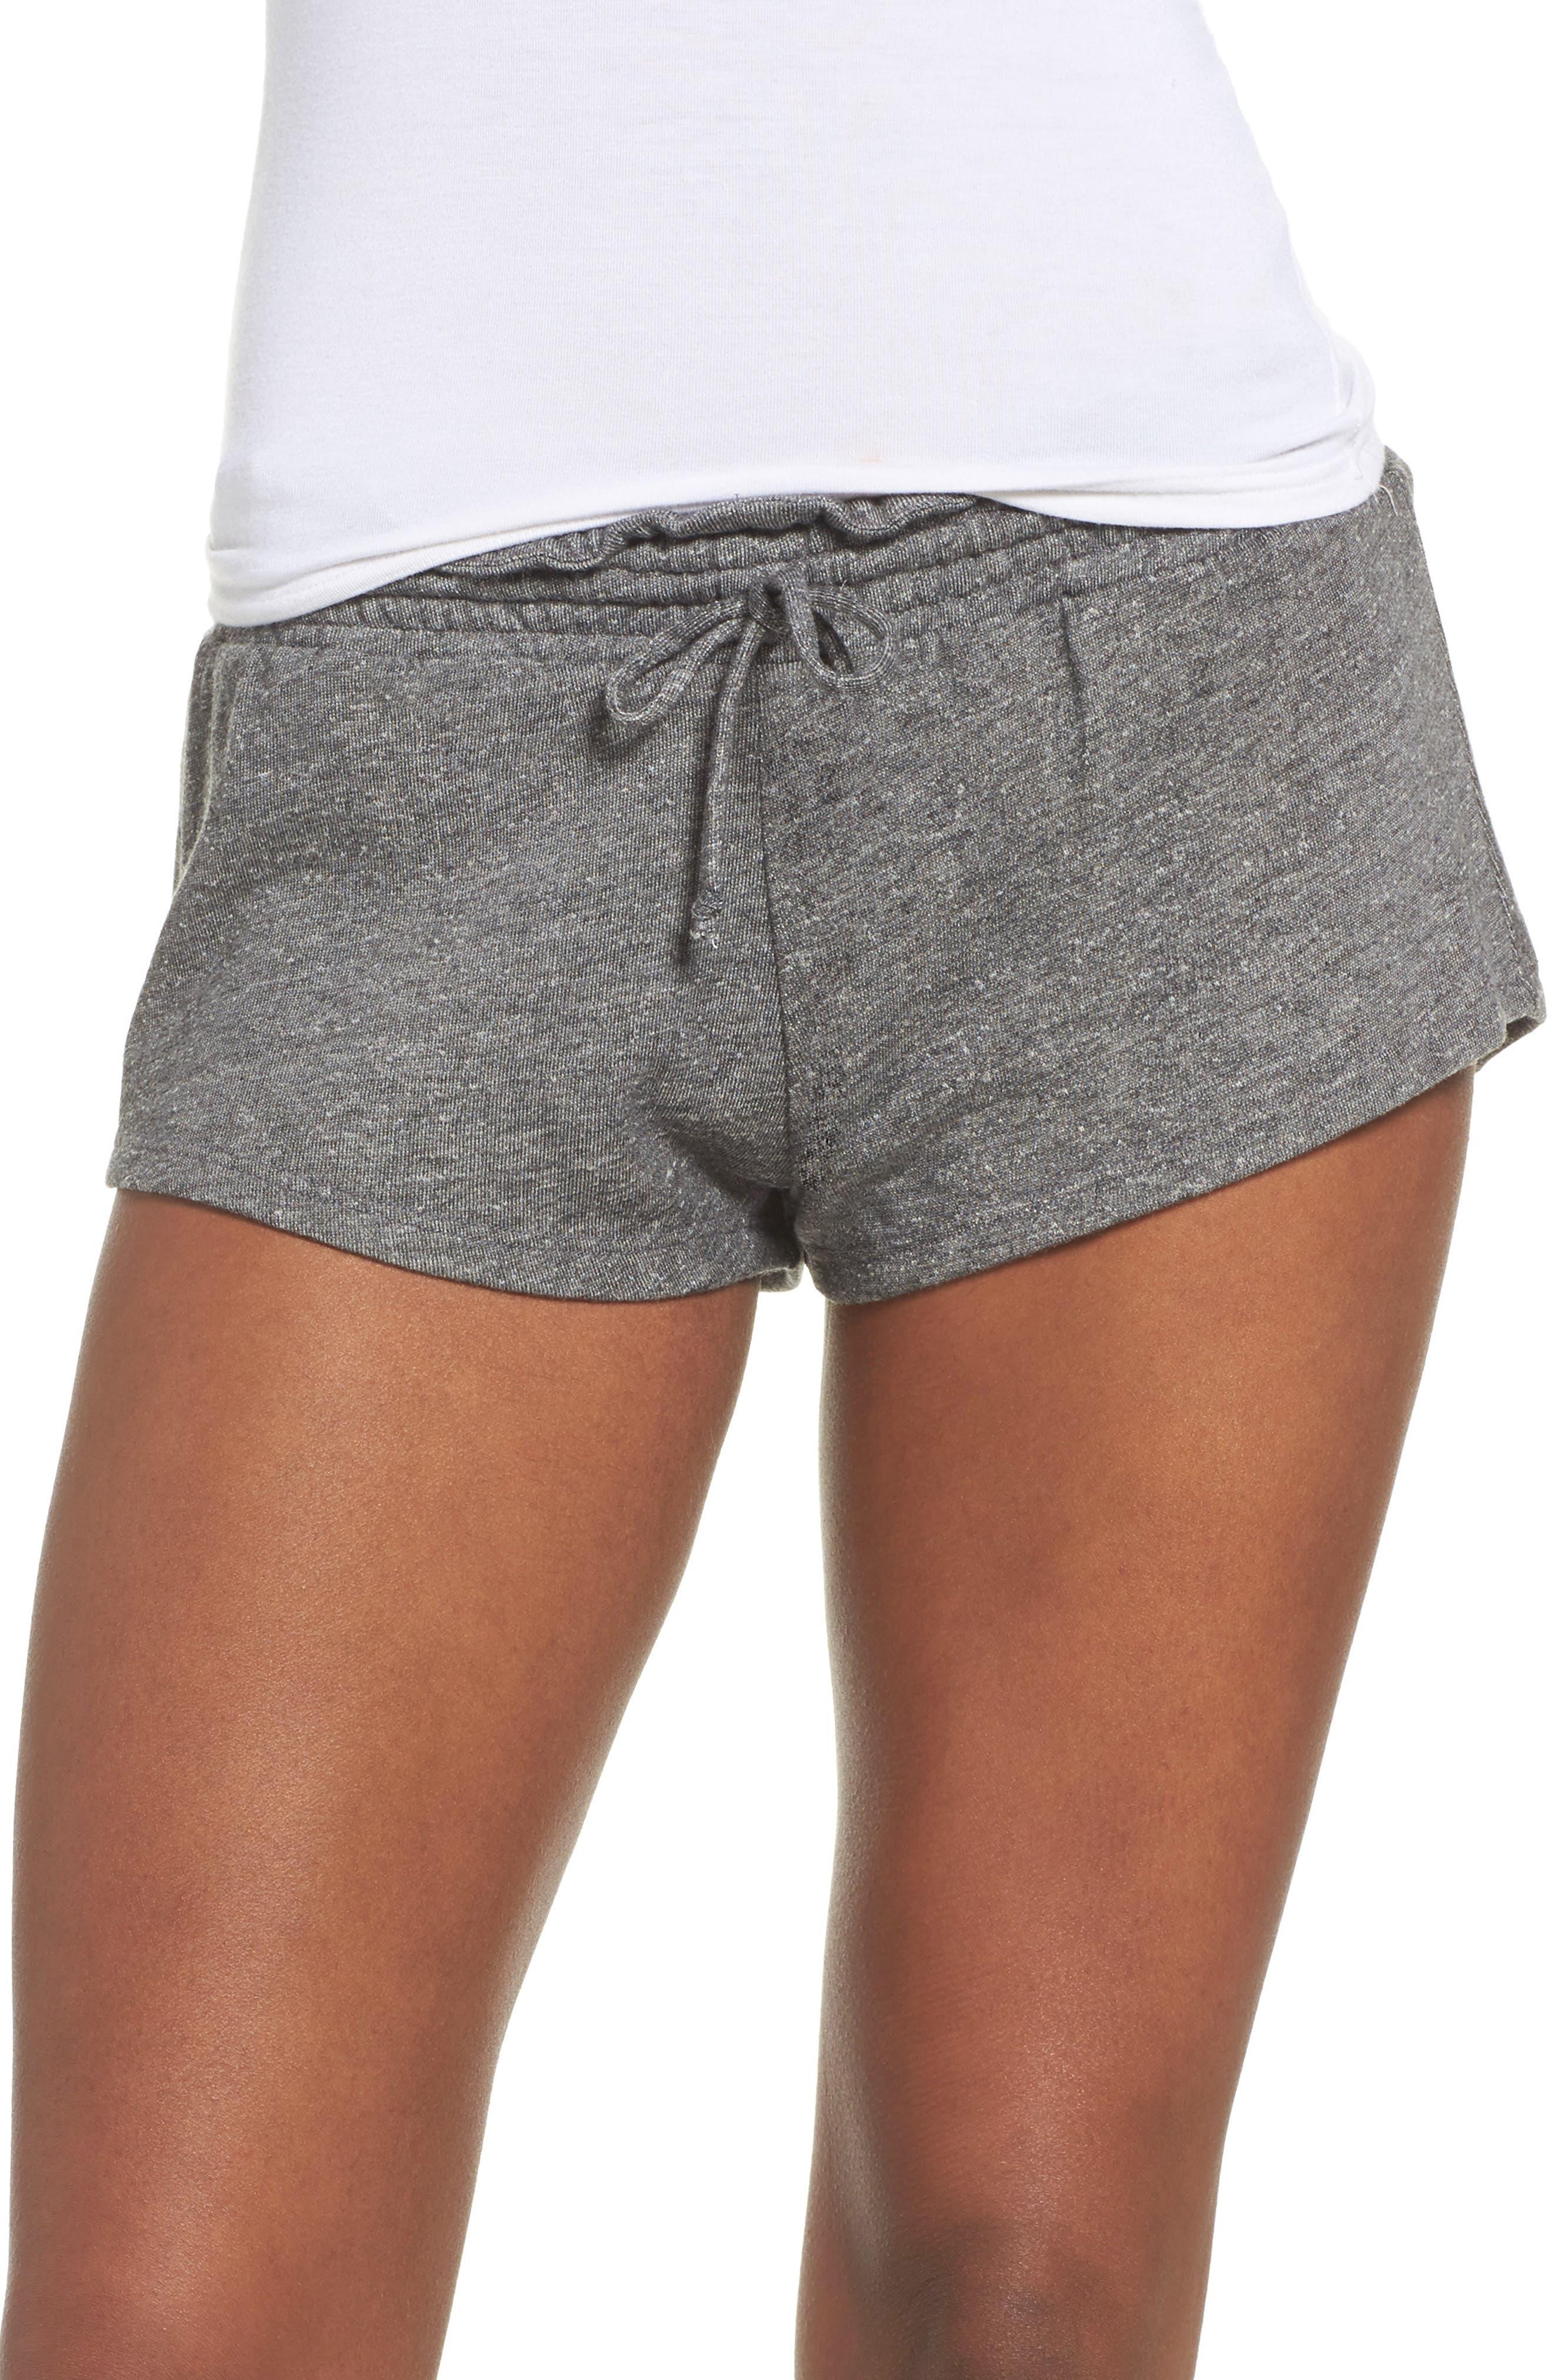 Olympia Theodora Dallas Shorts